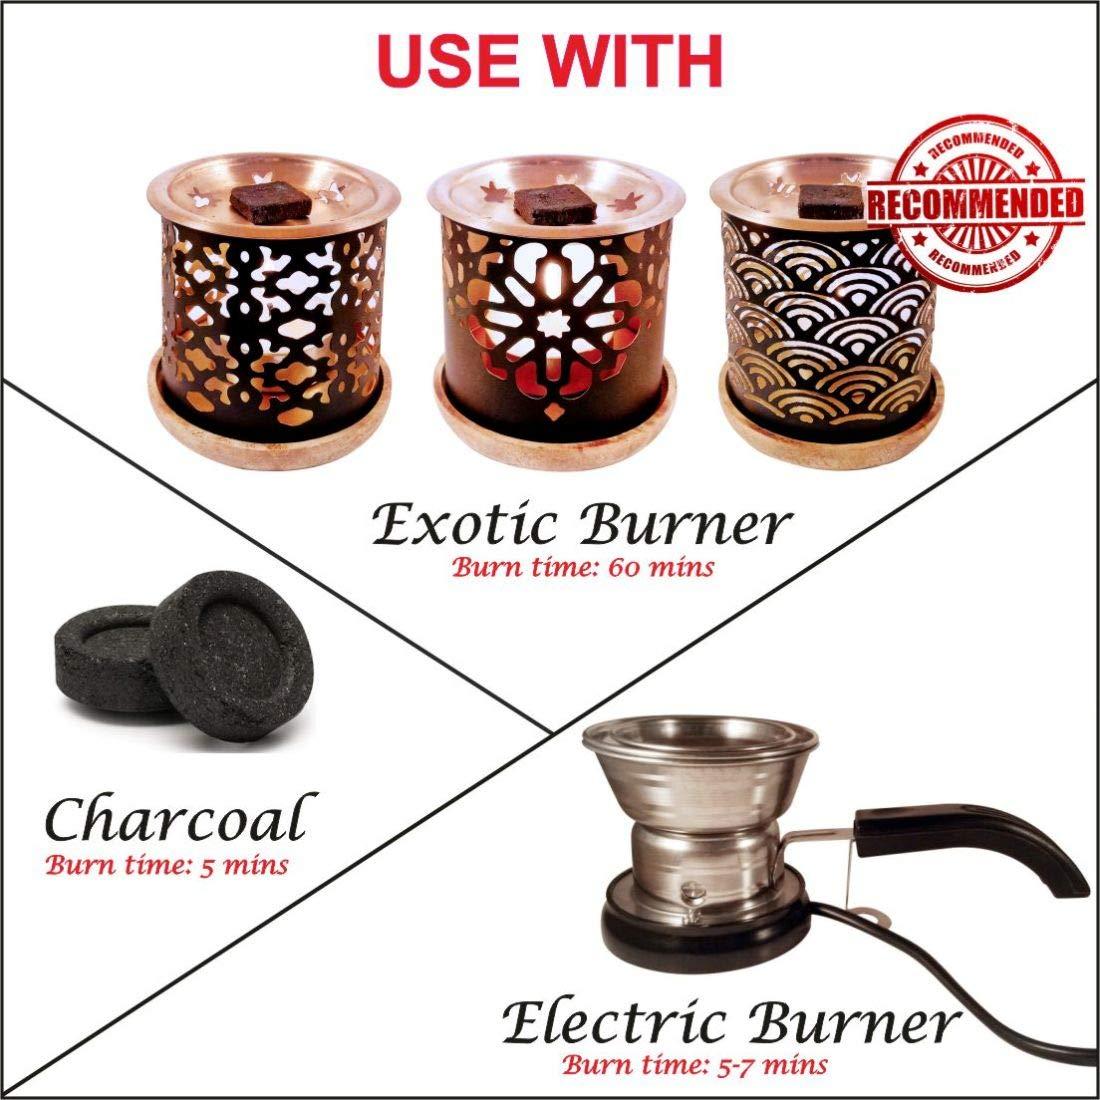 Dukhni Oud Bakhoor Incense Variety Box & Rainbow Bakhoor Burner - Gift Set & Starter Kit by Dukhni (Image #6)